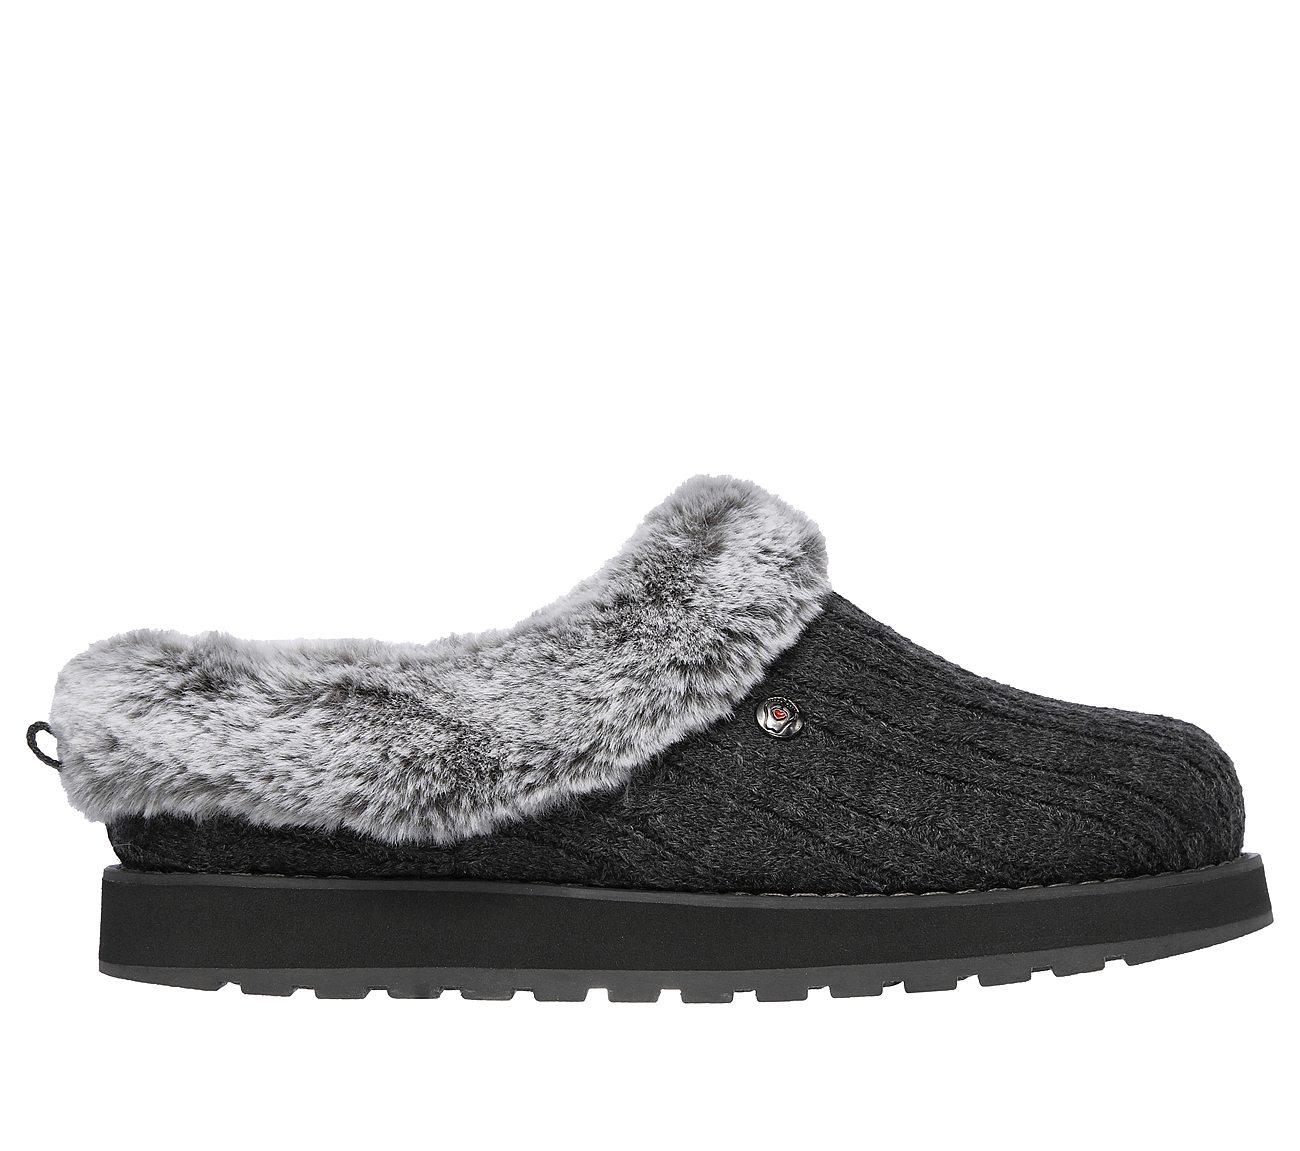 Skechers SK31204 Bobs Keepsakes Ice Storm charcoal 3-8 ladies mule slipper size 3-8 charcoal 518484